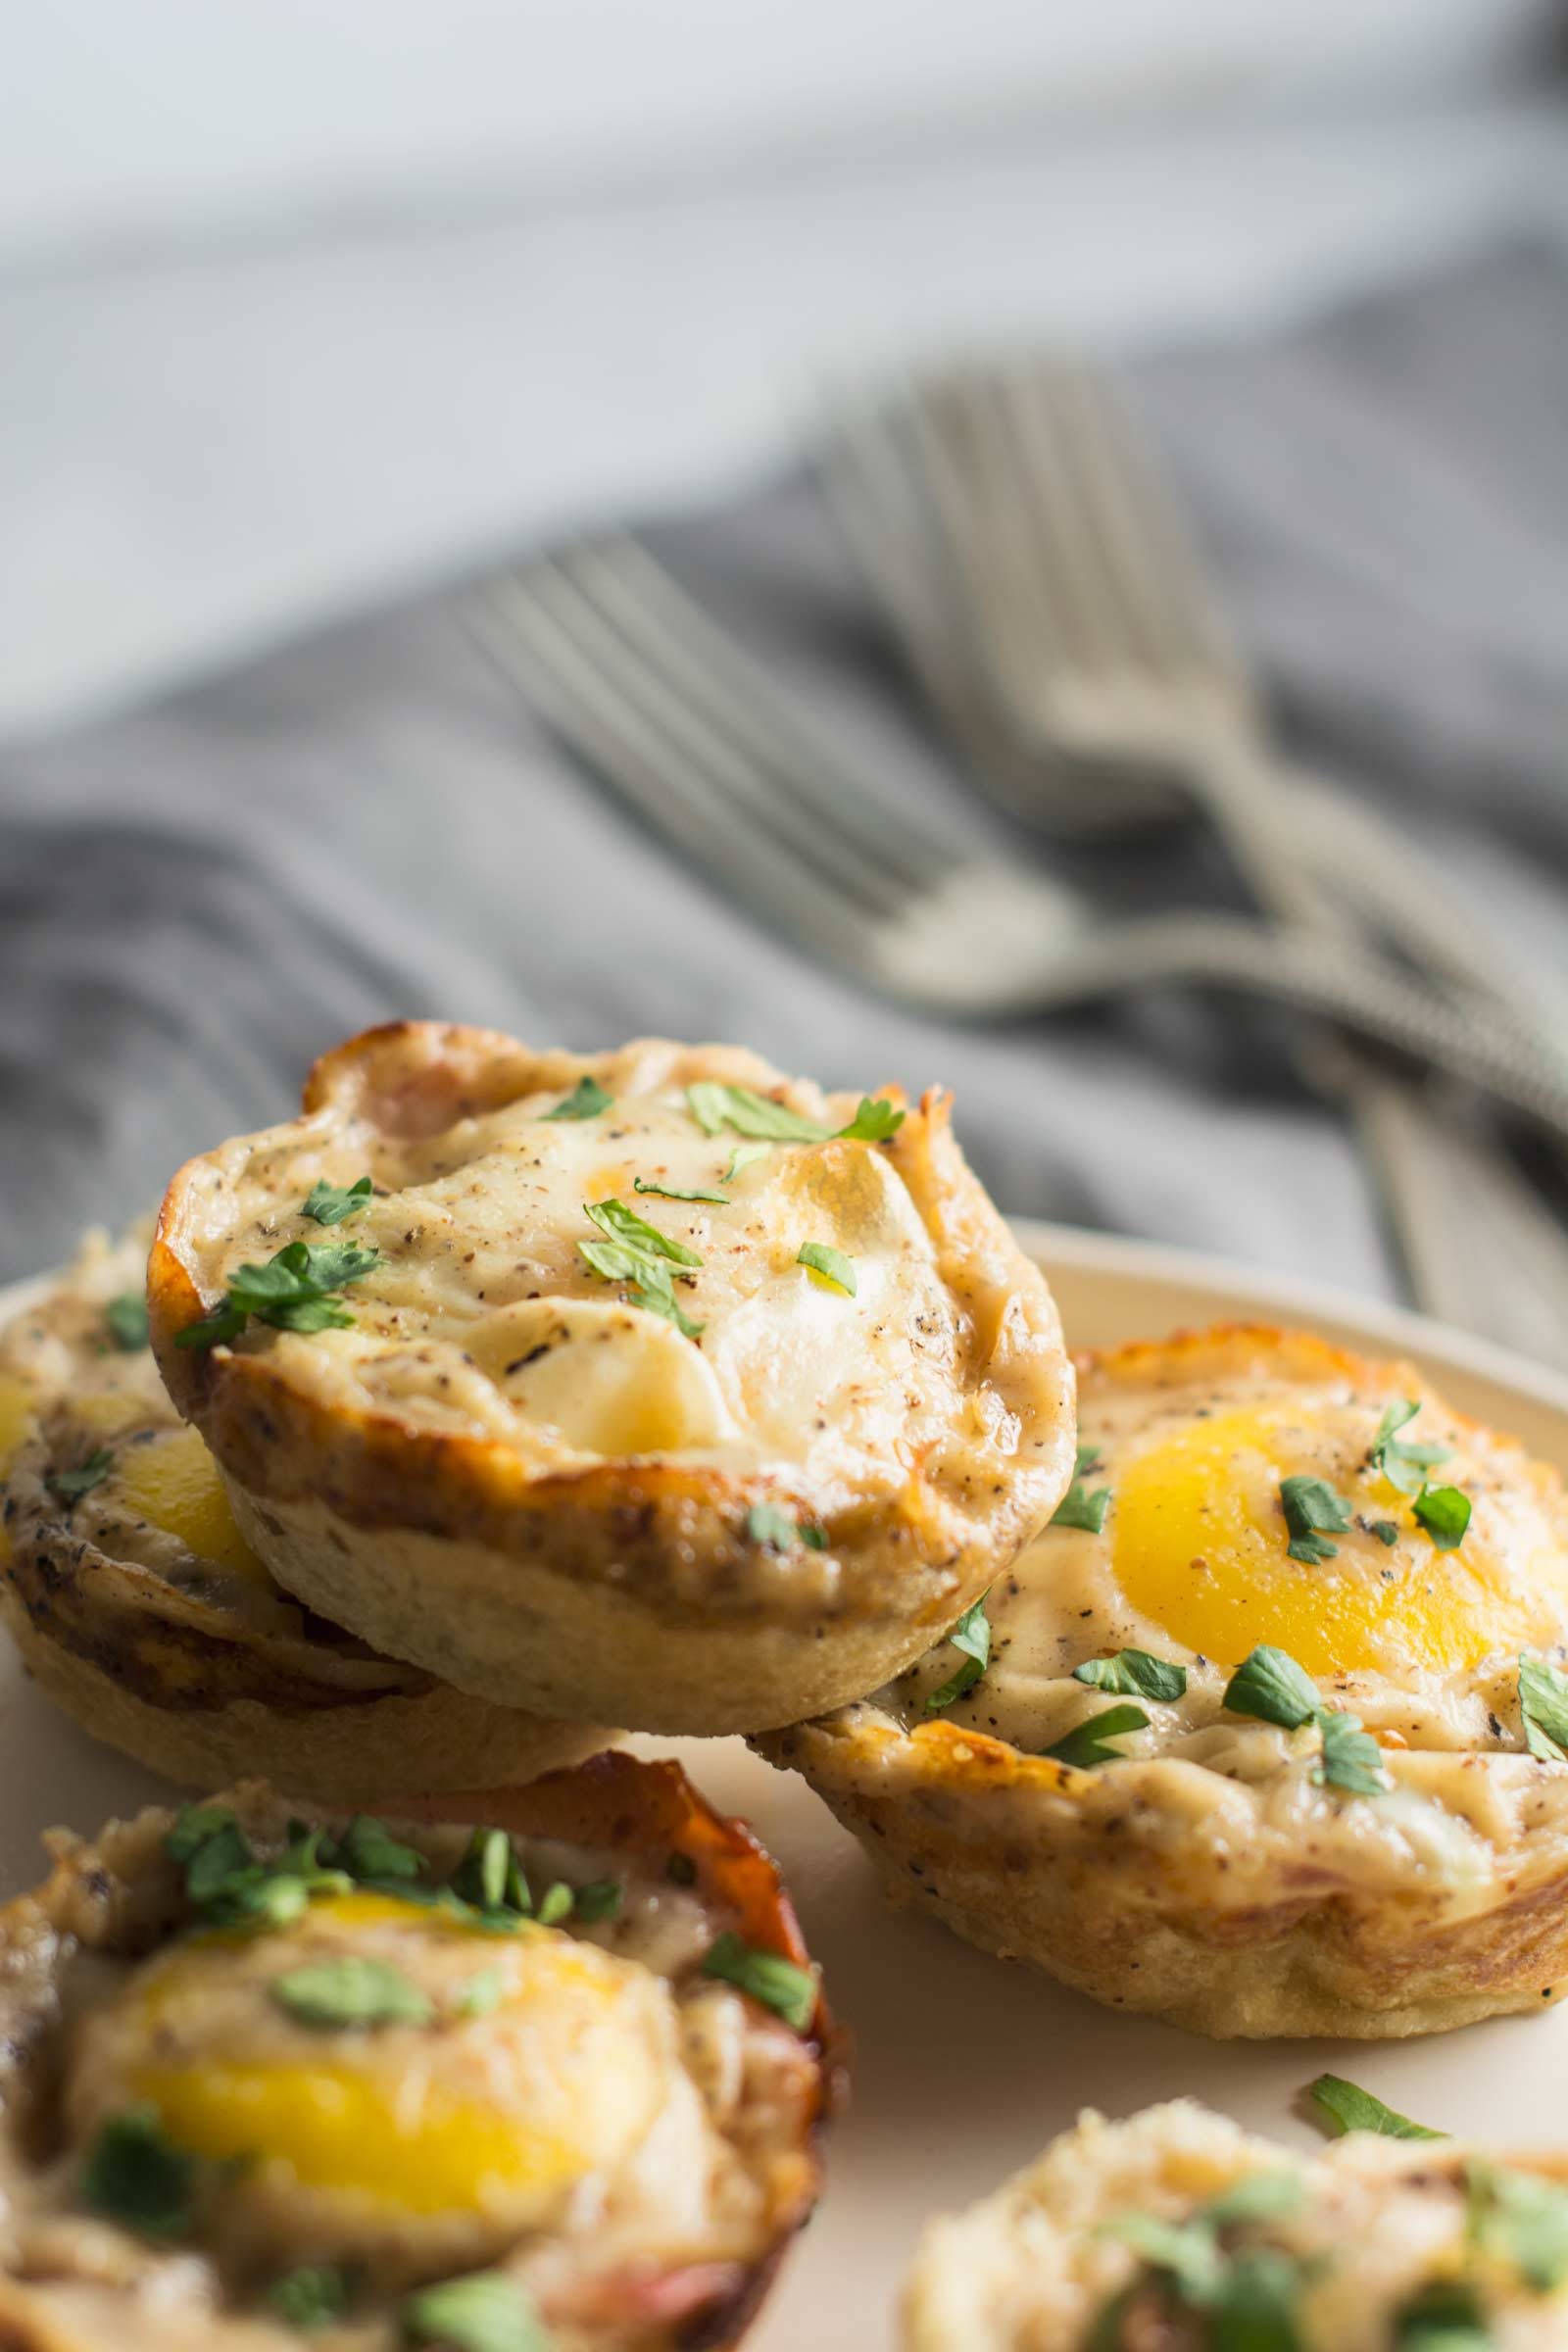 Enjoy these Croque Madame inspired Breakfast Bites for breakfast, lunch or dinner! Recipe @LittleFiggyFood